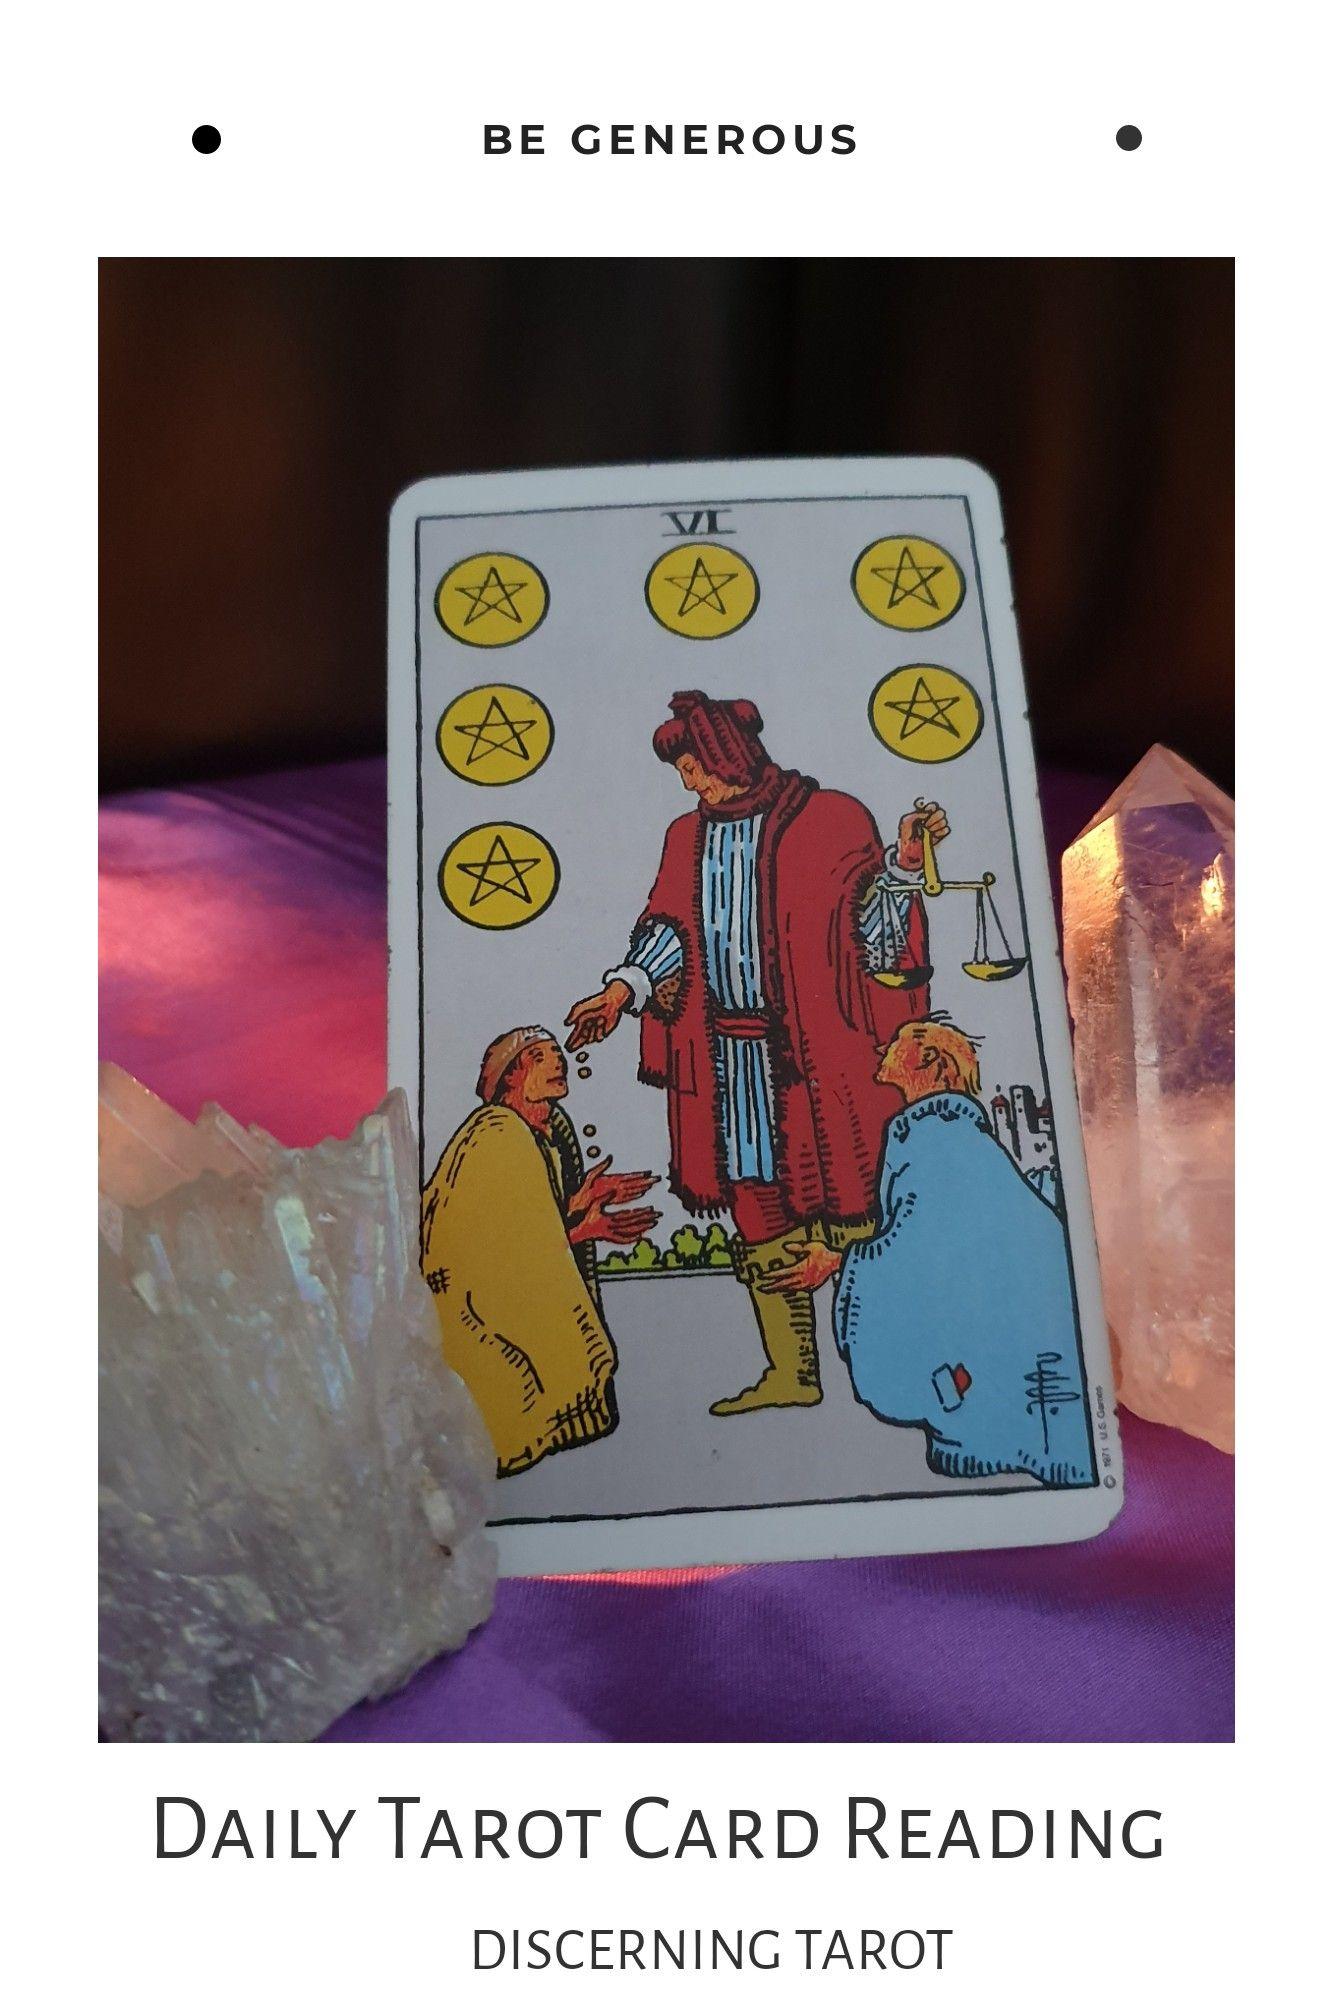 Daily Tarot Card Reading Reading Tarot Cards Tarot Reading Tarot The two of pentacles is a minor arcana tarot card that symbolizes balance and prioritization. pinterest